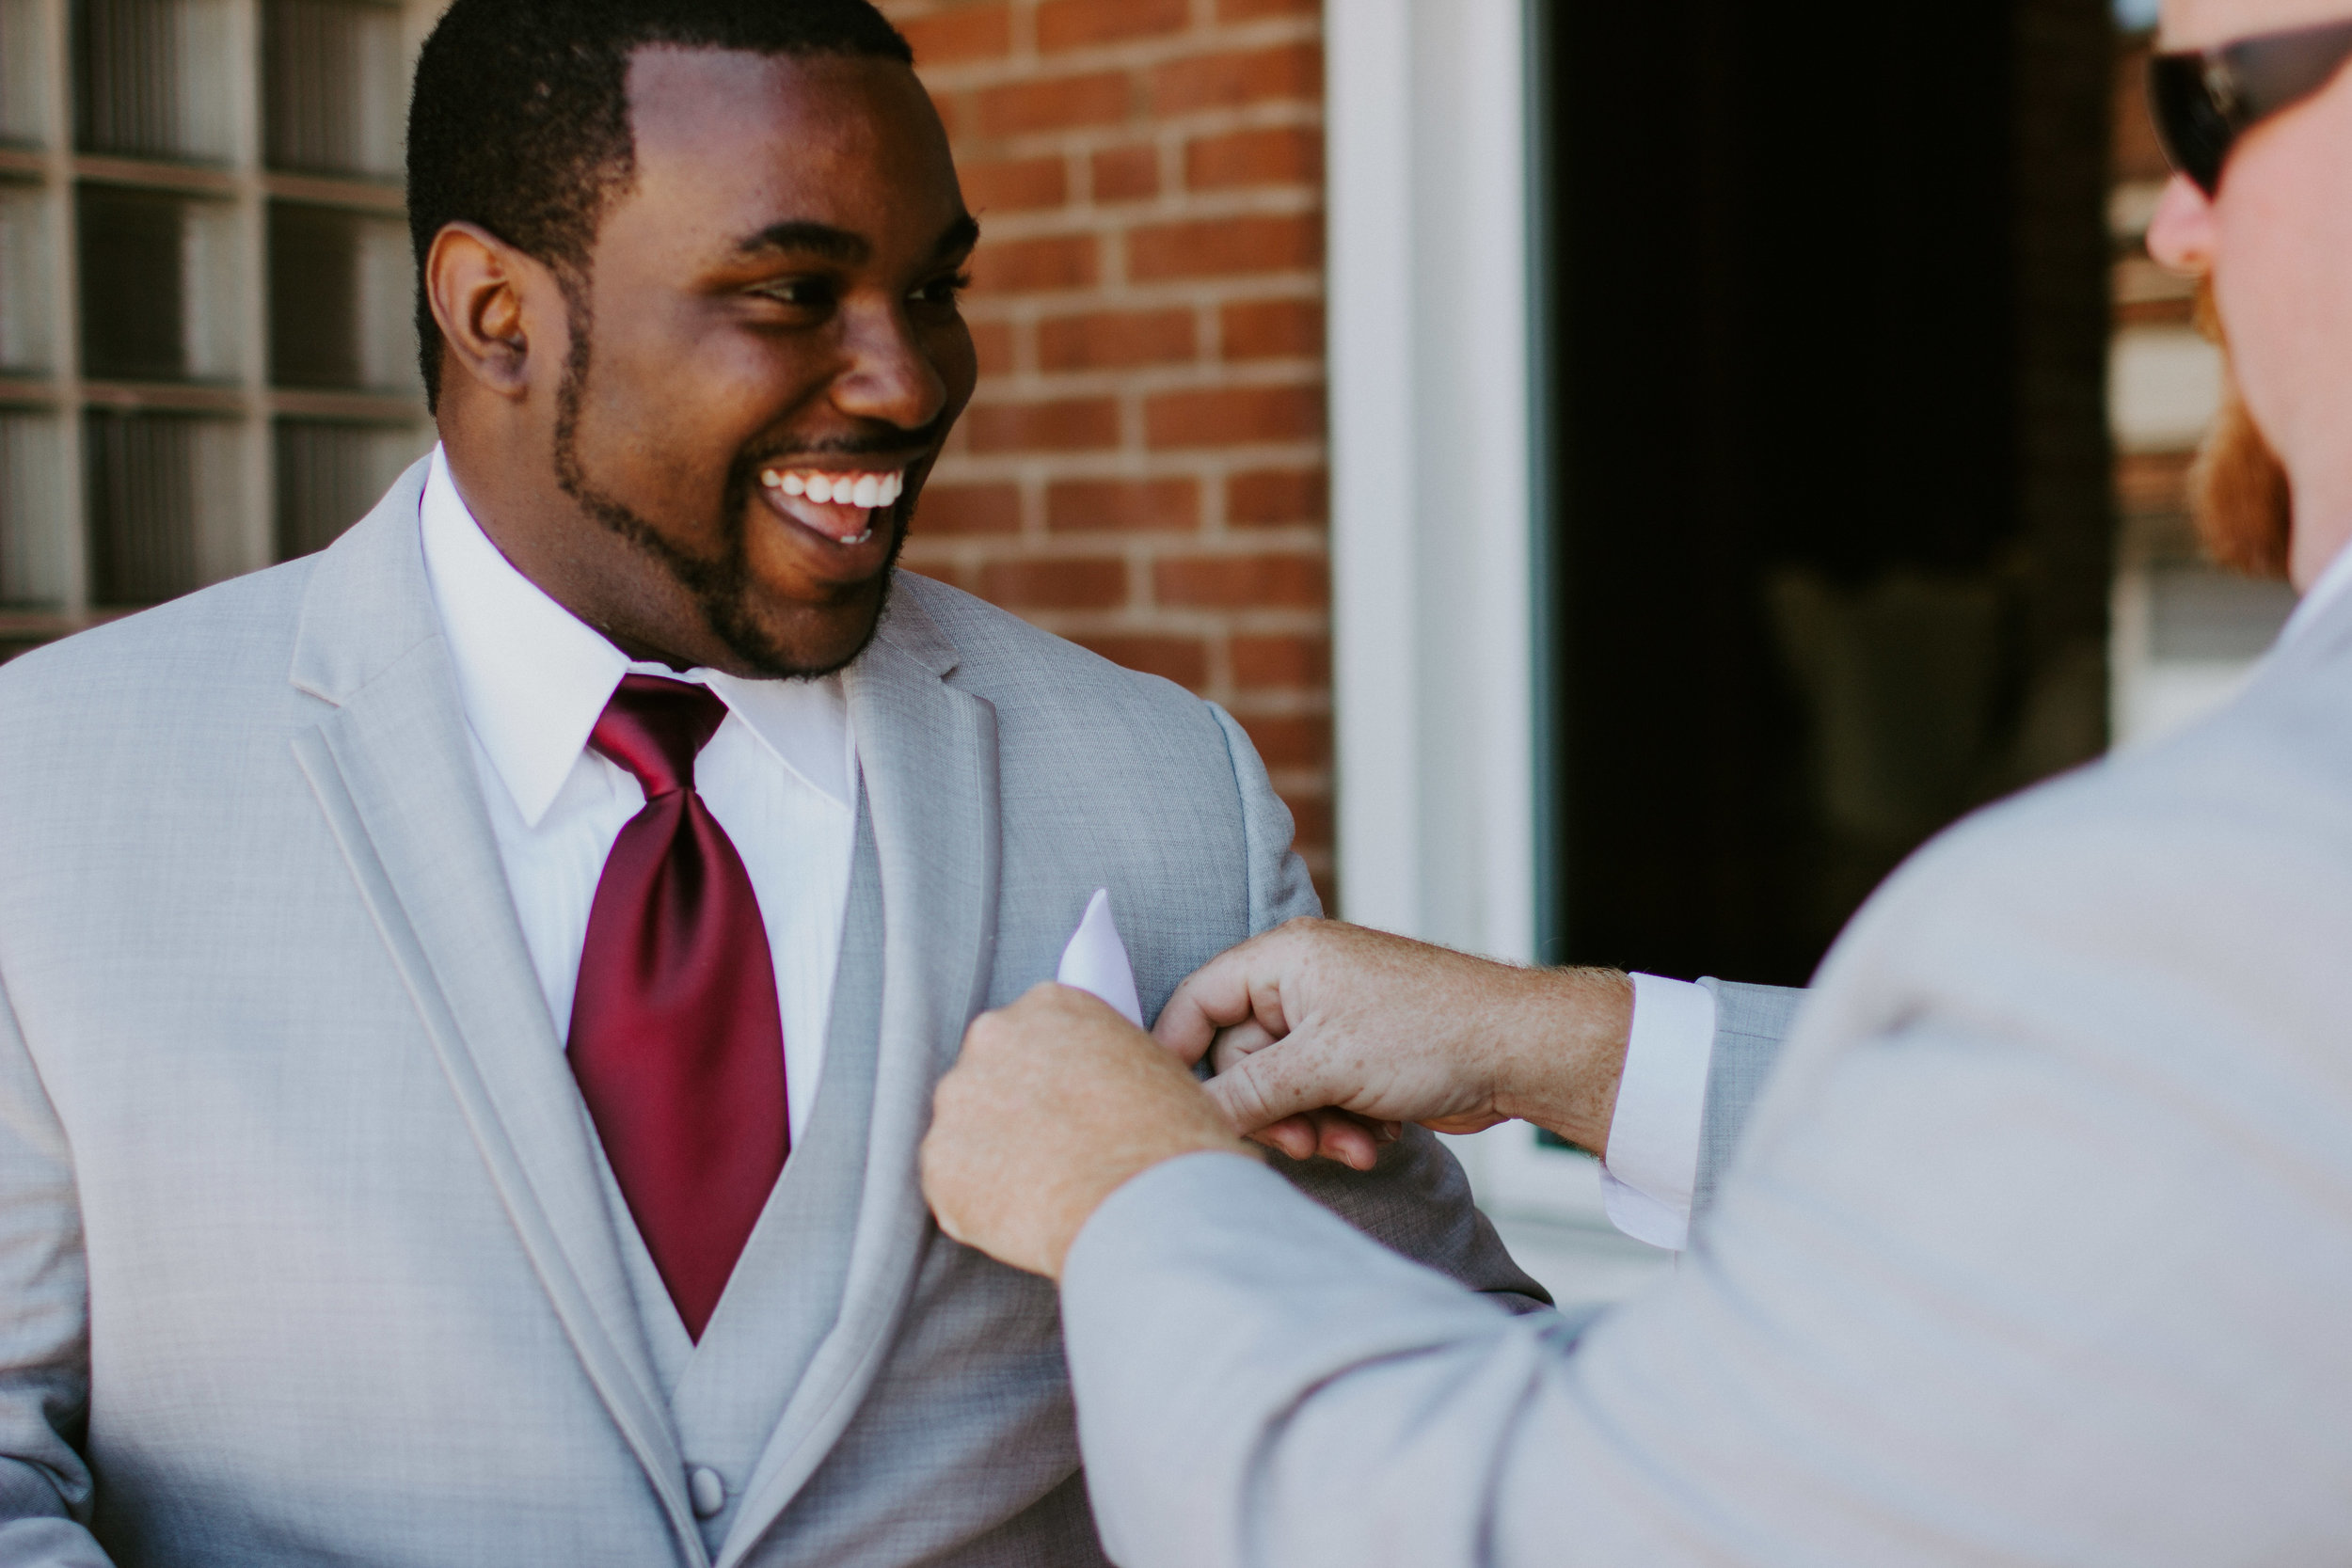 WonderlyCreative_Wedding_6.7.18_Khara&Dwayne_-204.jpg